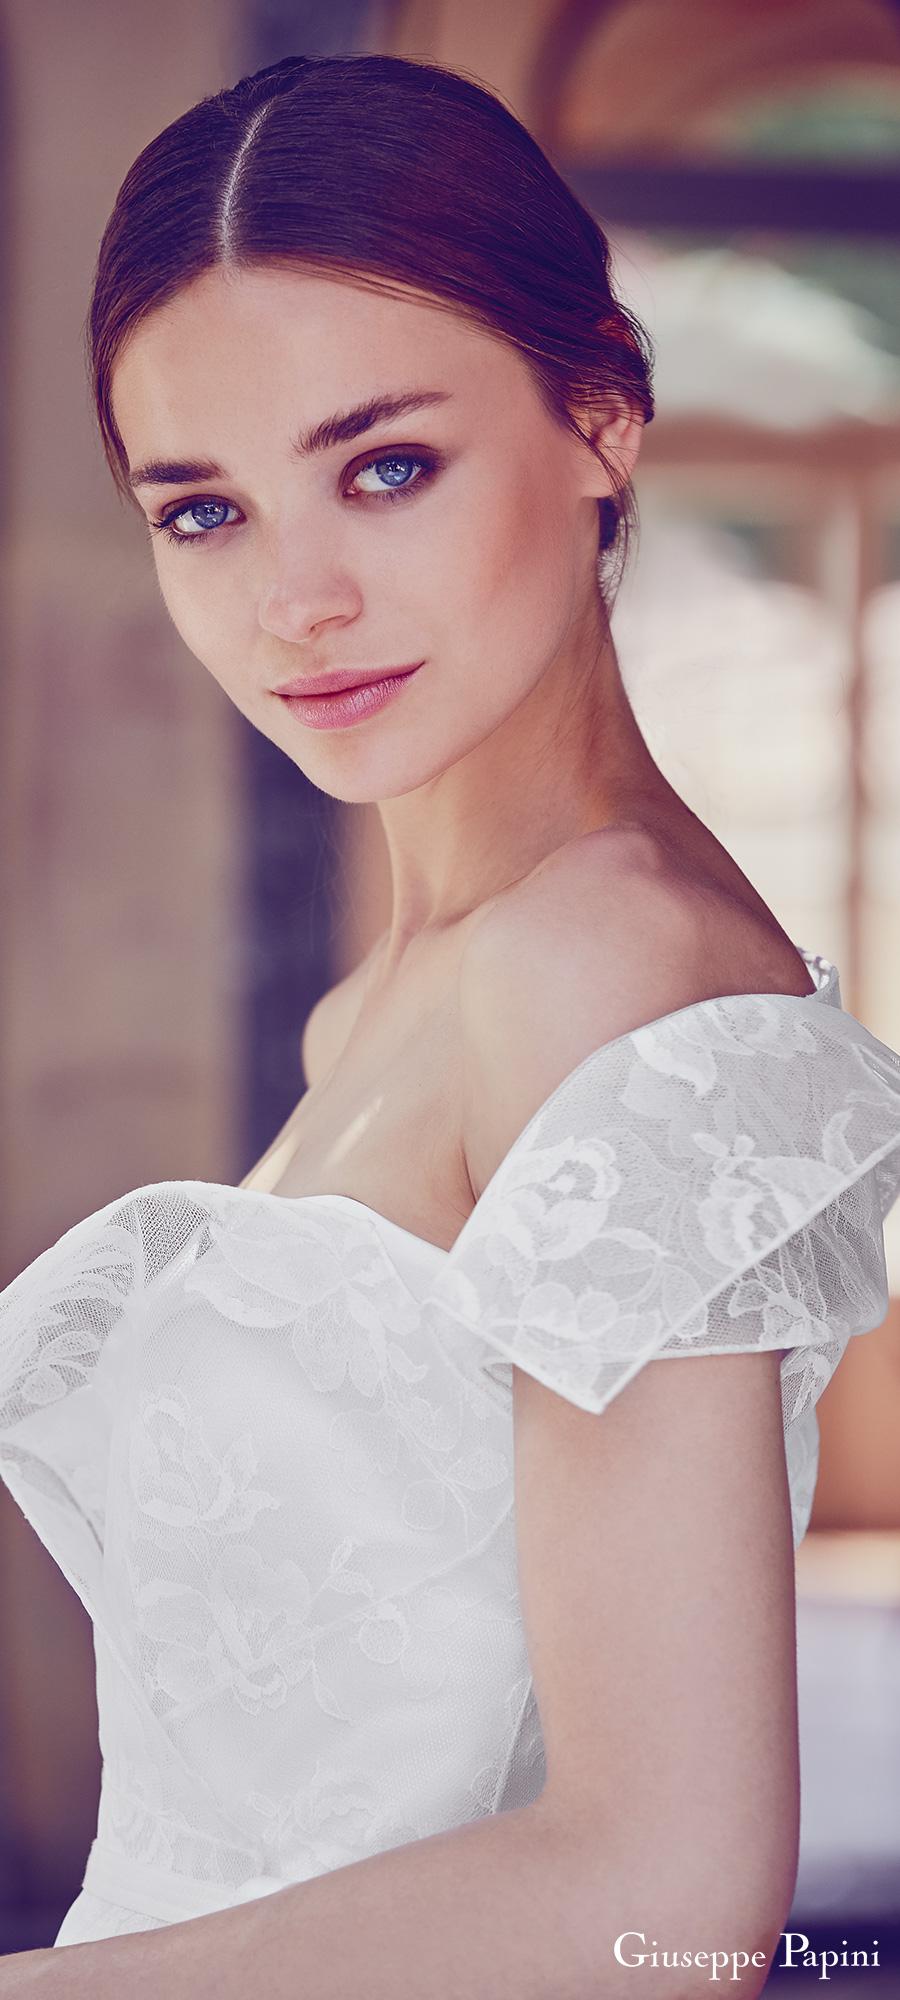 giuseppe papini 2017 (como) short sleeve sweetheart crochet lace wedding dress zv